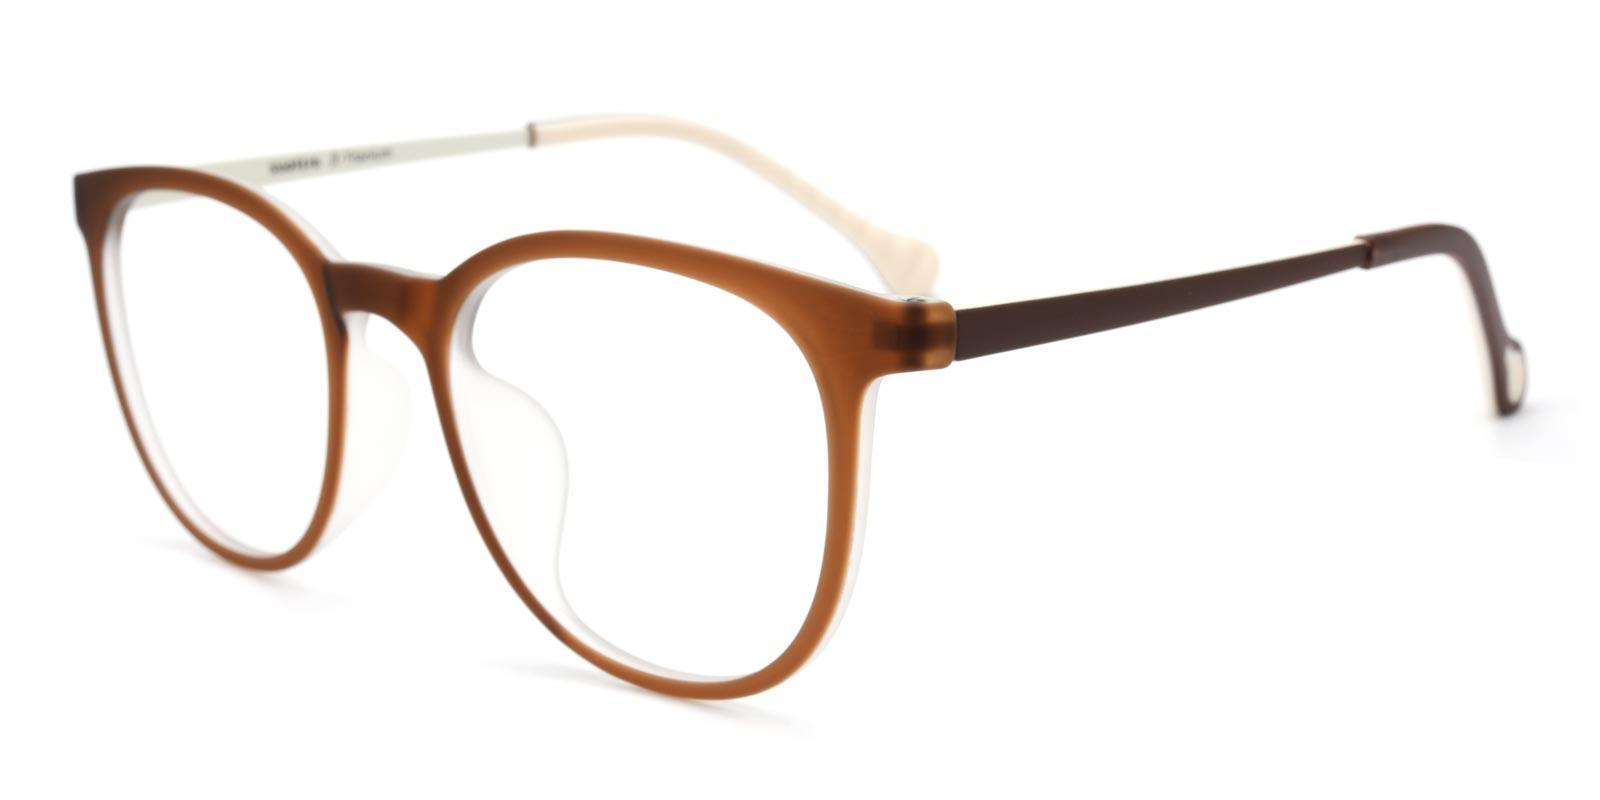 Aaron-Brown-Round-Combination-Eyeglasses-additional1